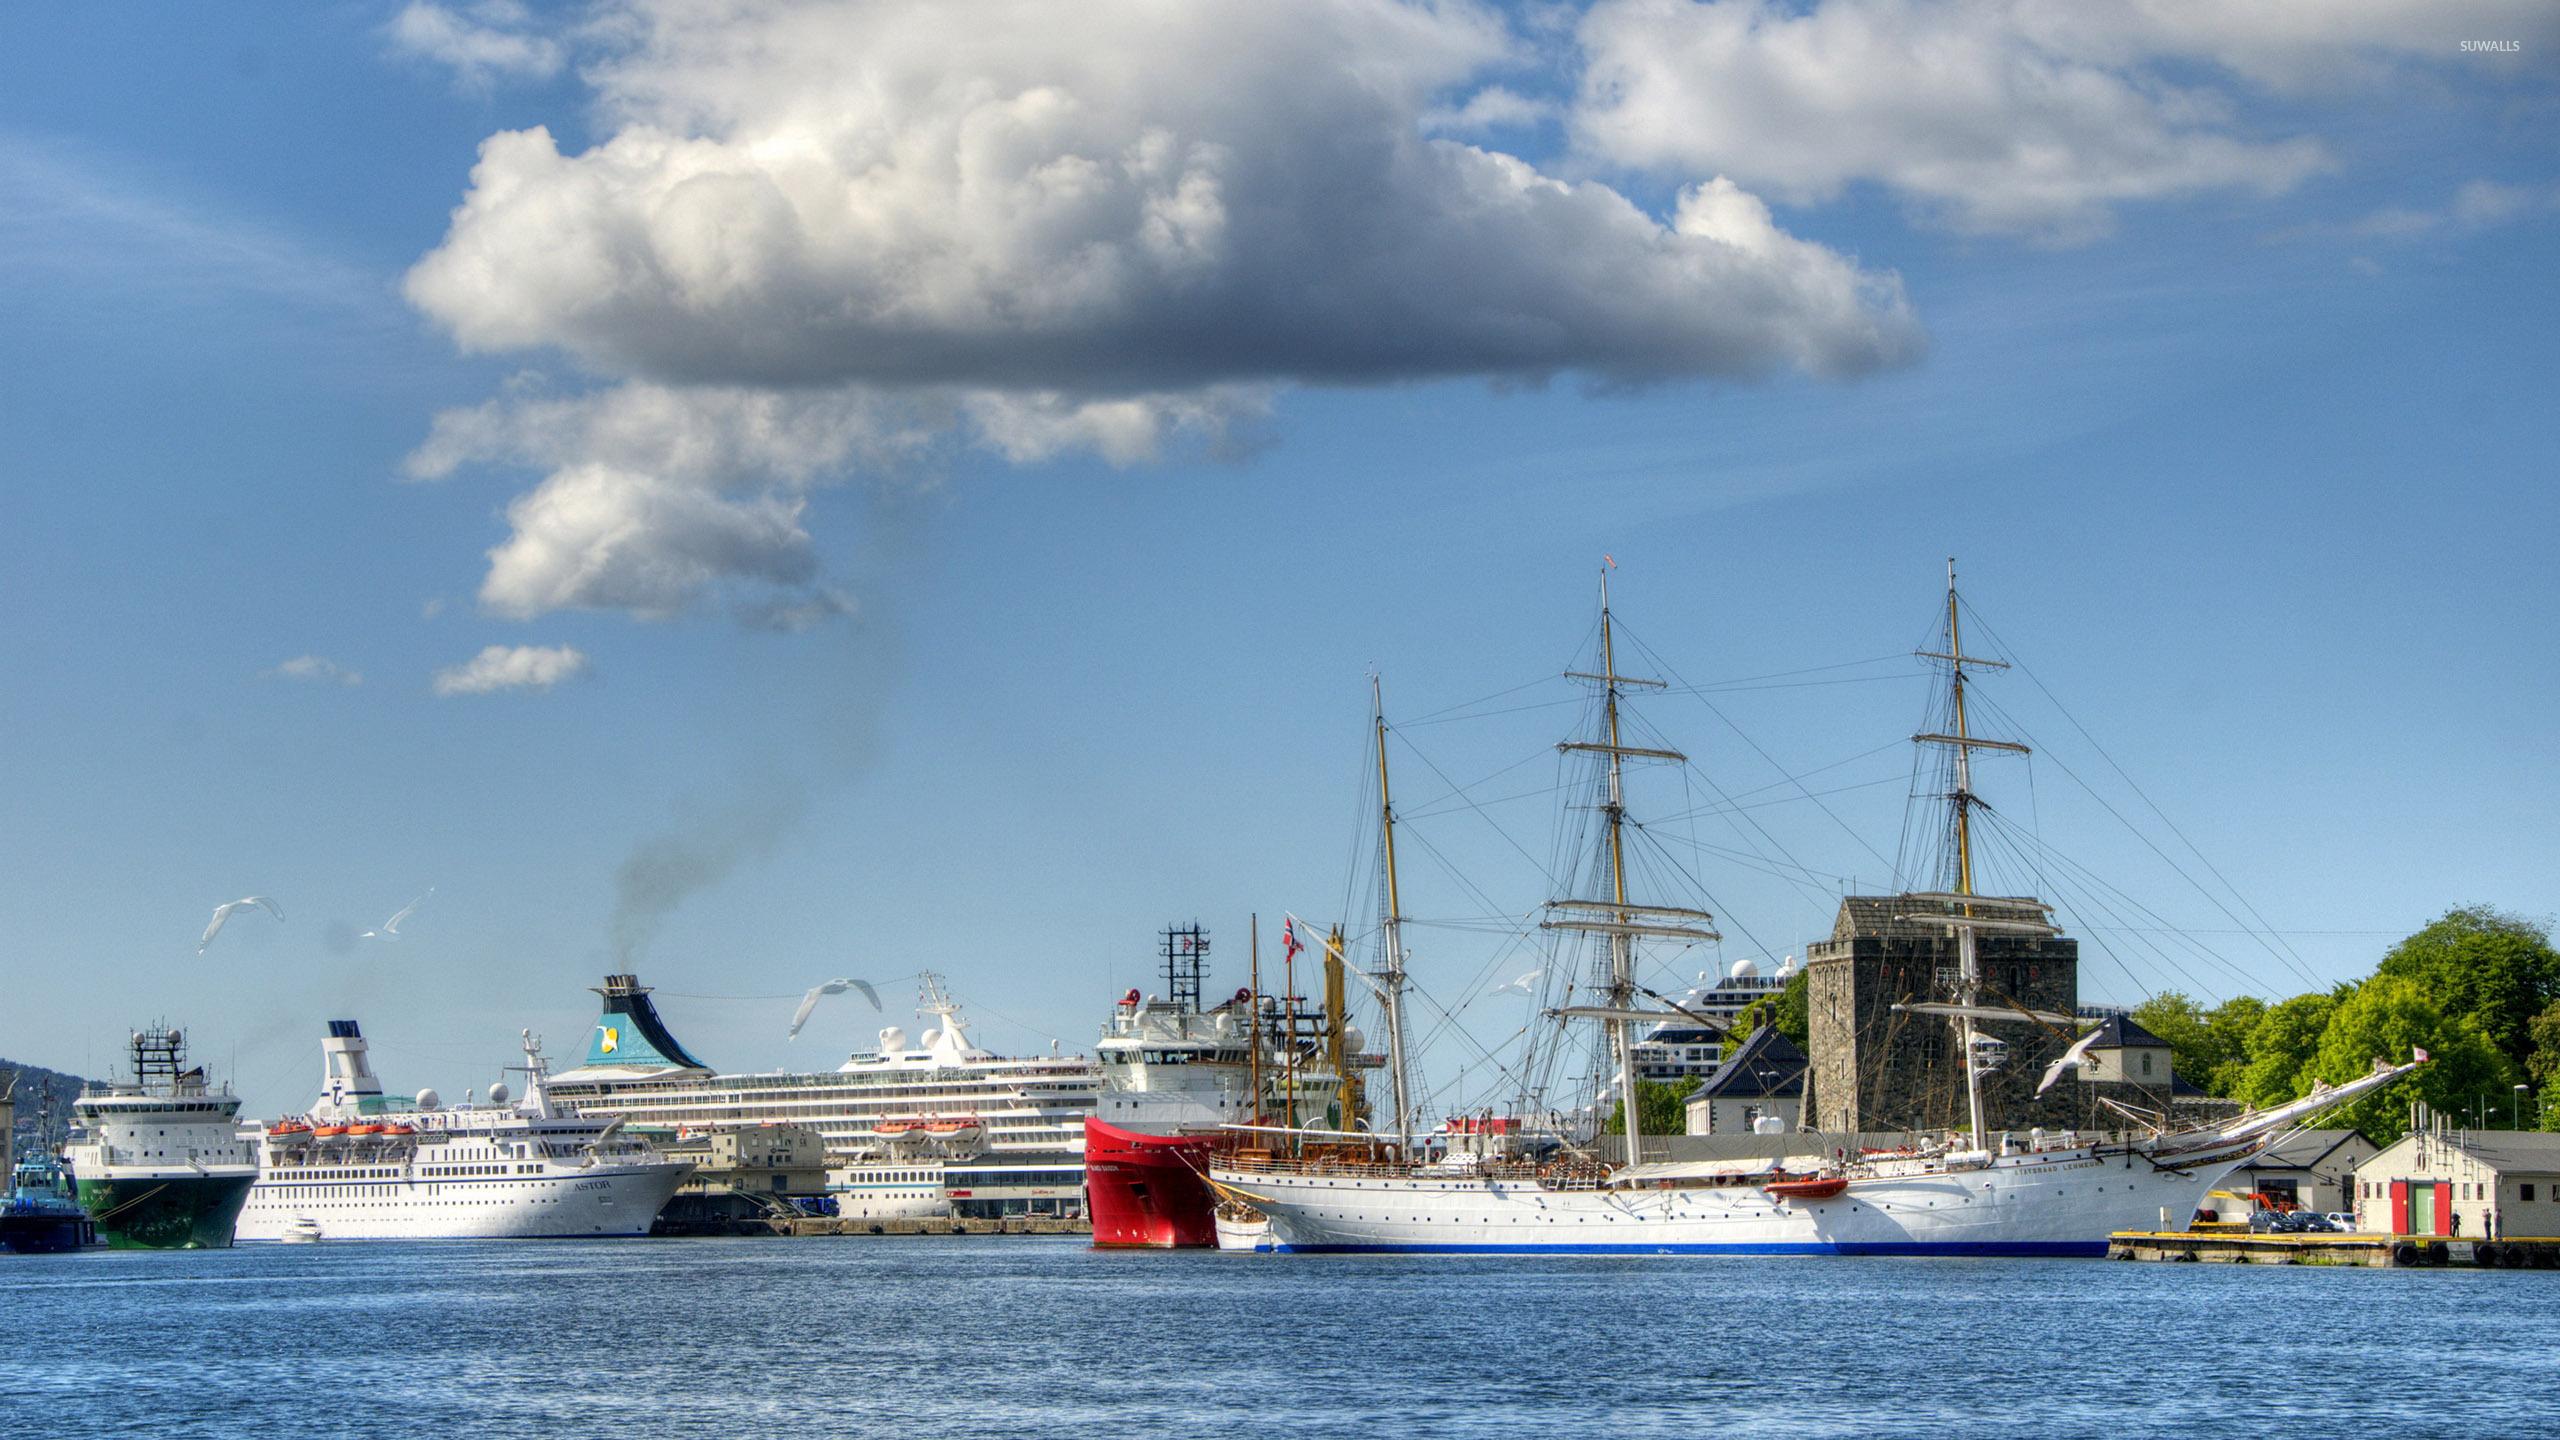 Fall Mountain Lake Wallpaper Cruise Ships In A Harbor Wallpaper Photography